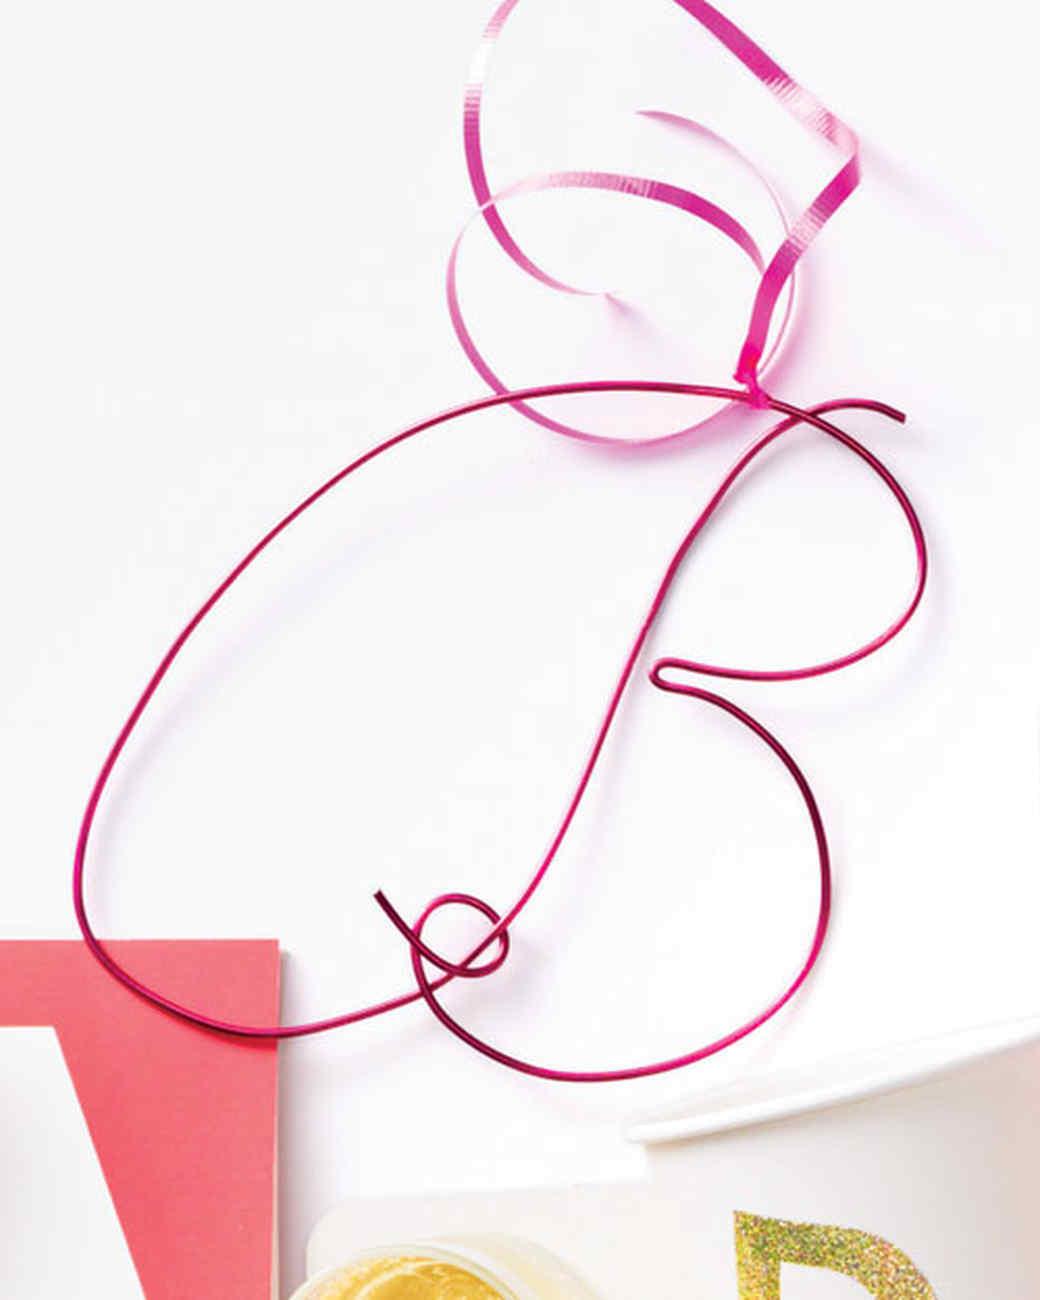 mld106559_0111_alphabet_b_shape.jpg